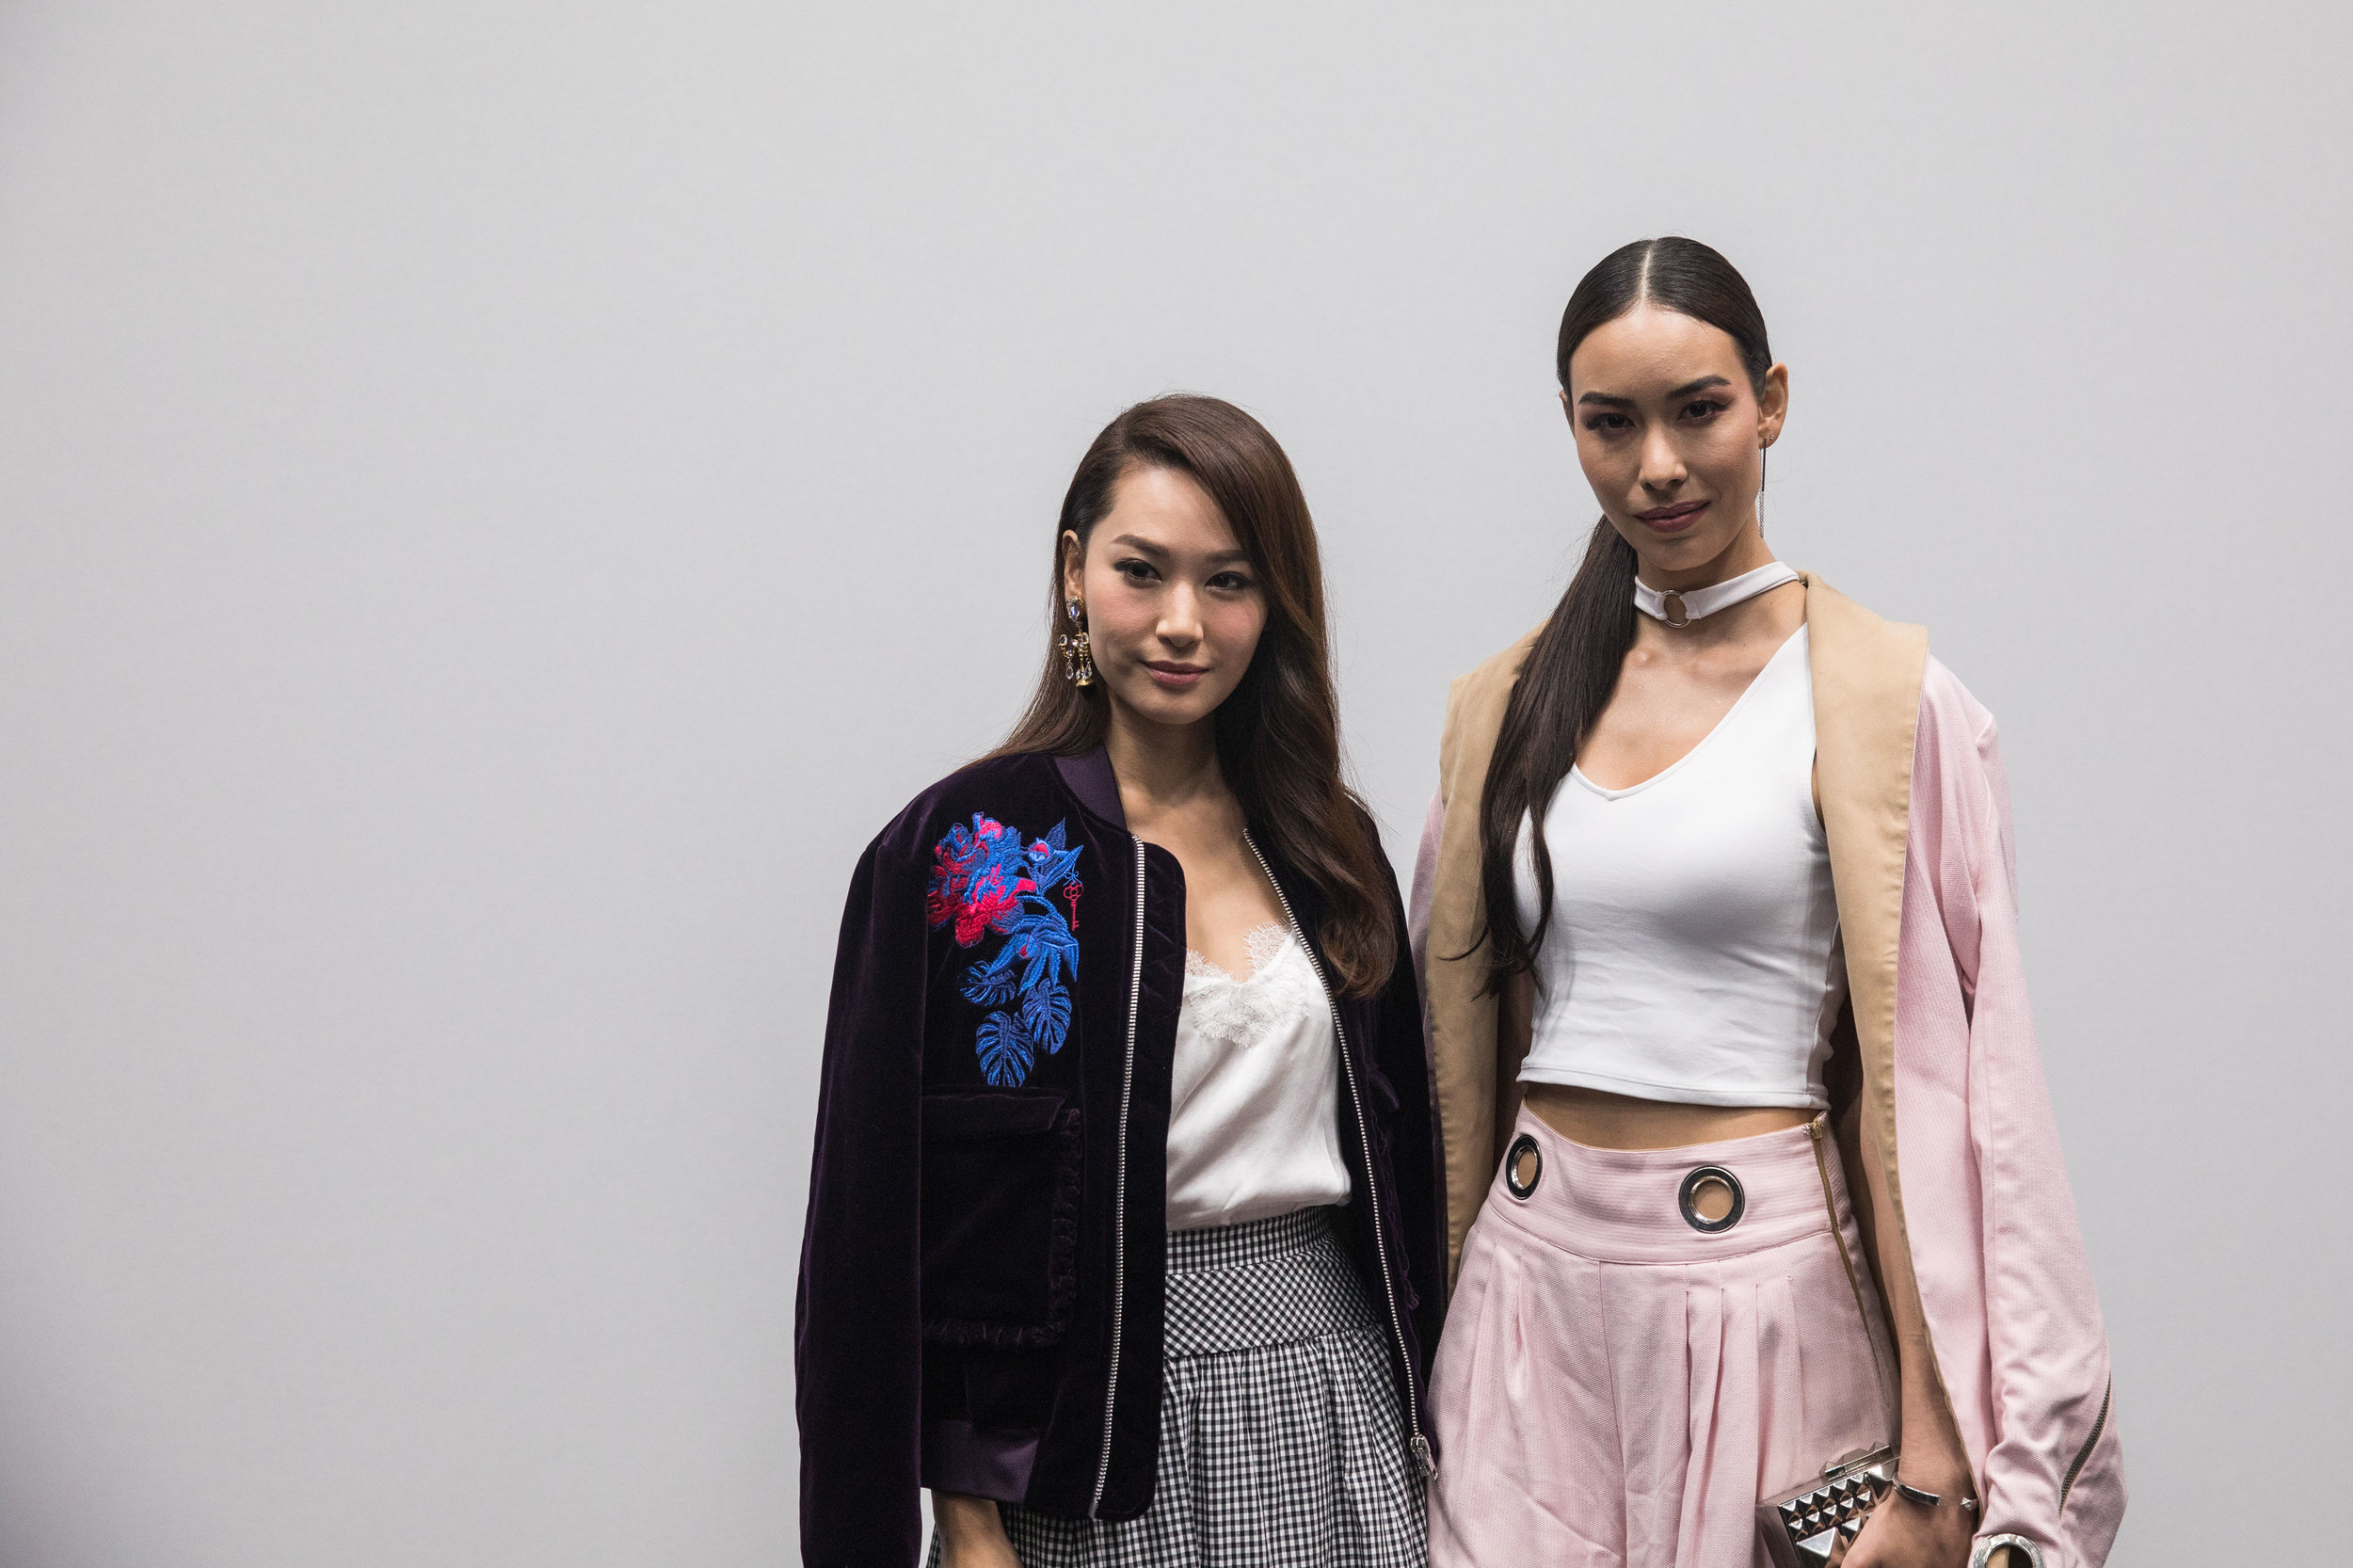 Redress Design Award ambassadors Kate Tsui and Sofia Wakabayshi attend the Redress Design Award 2017 Grand Final Show